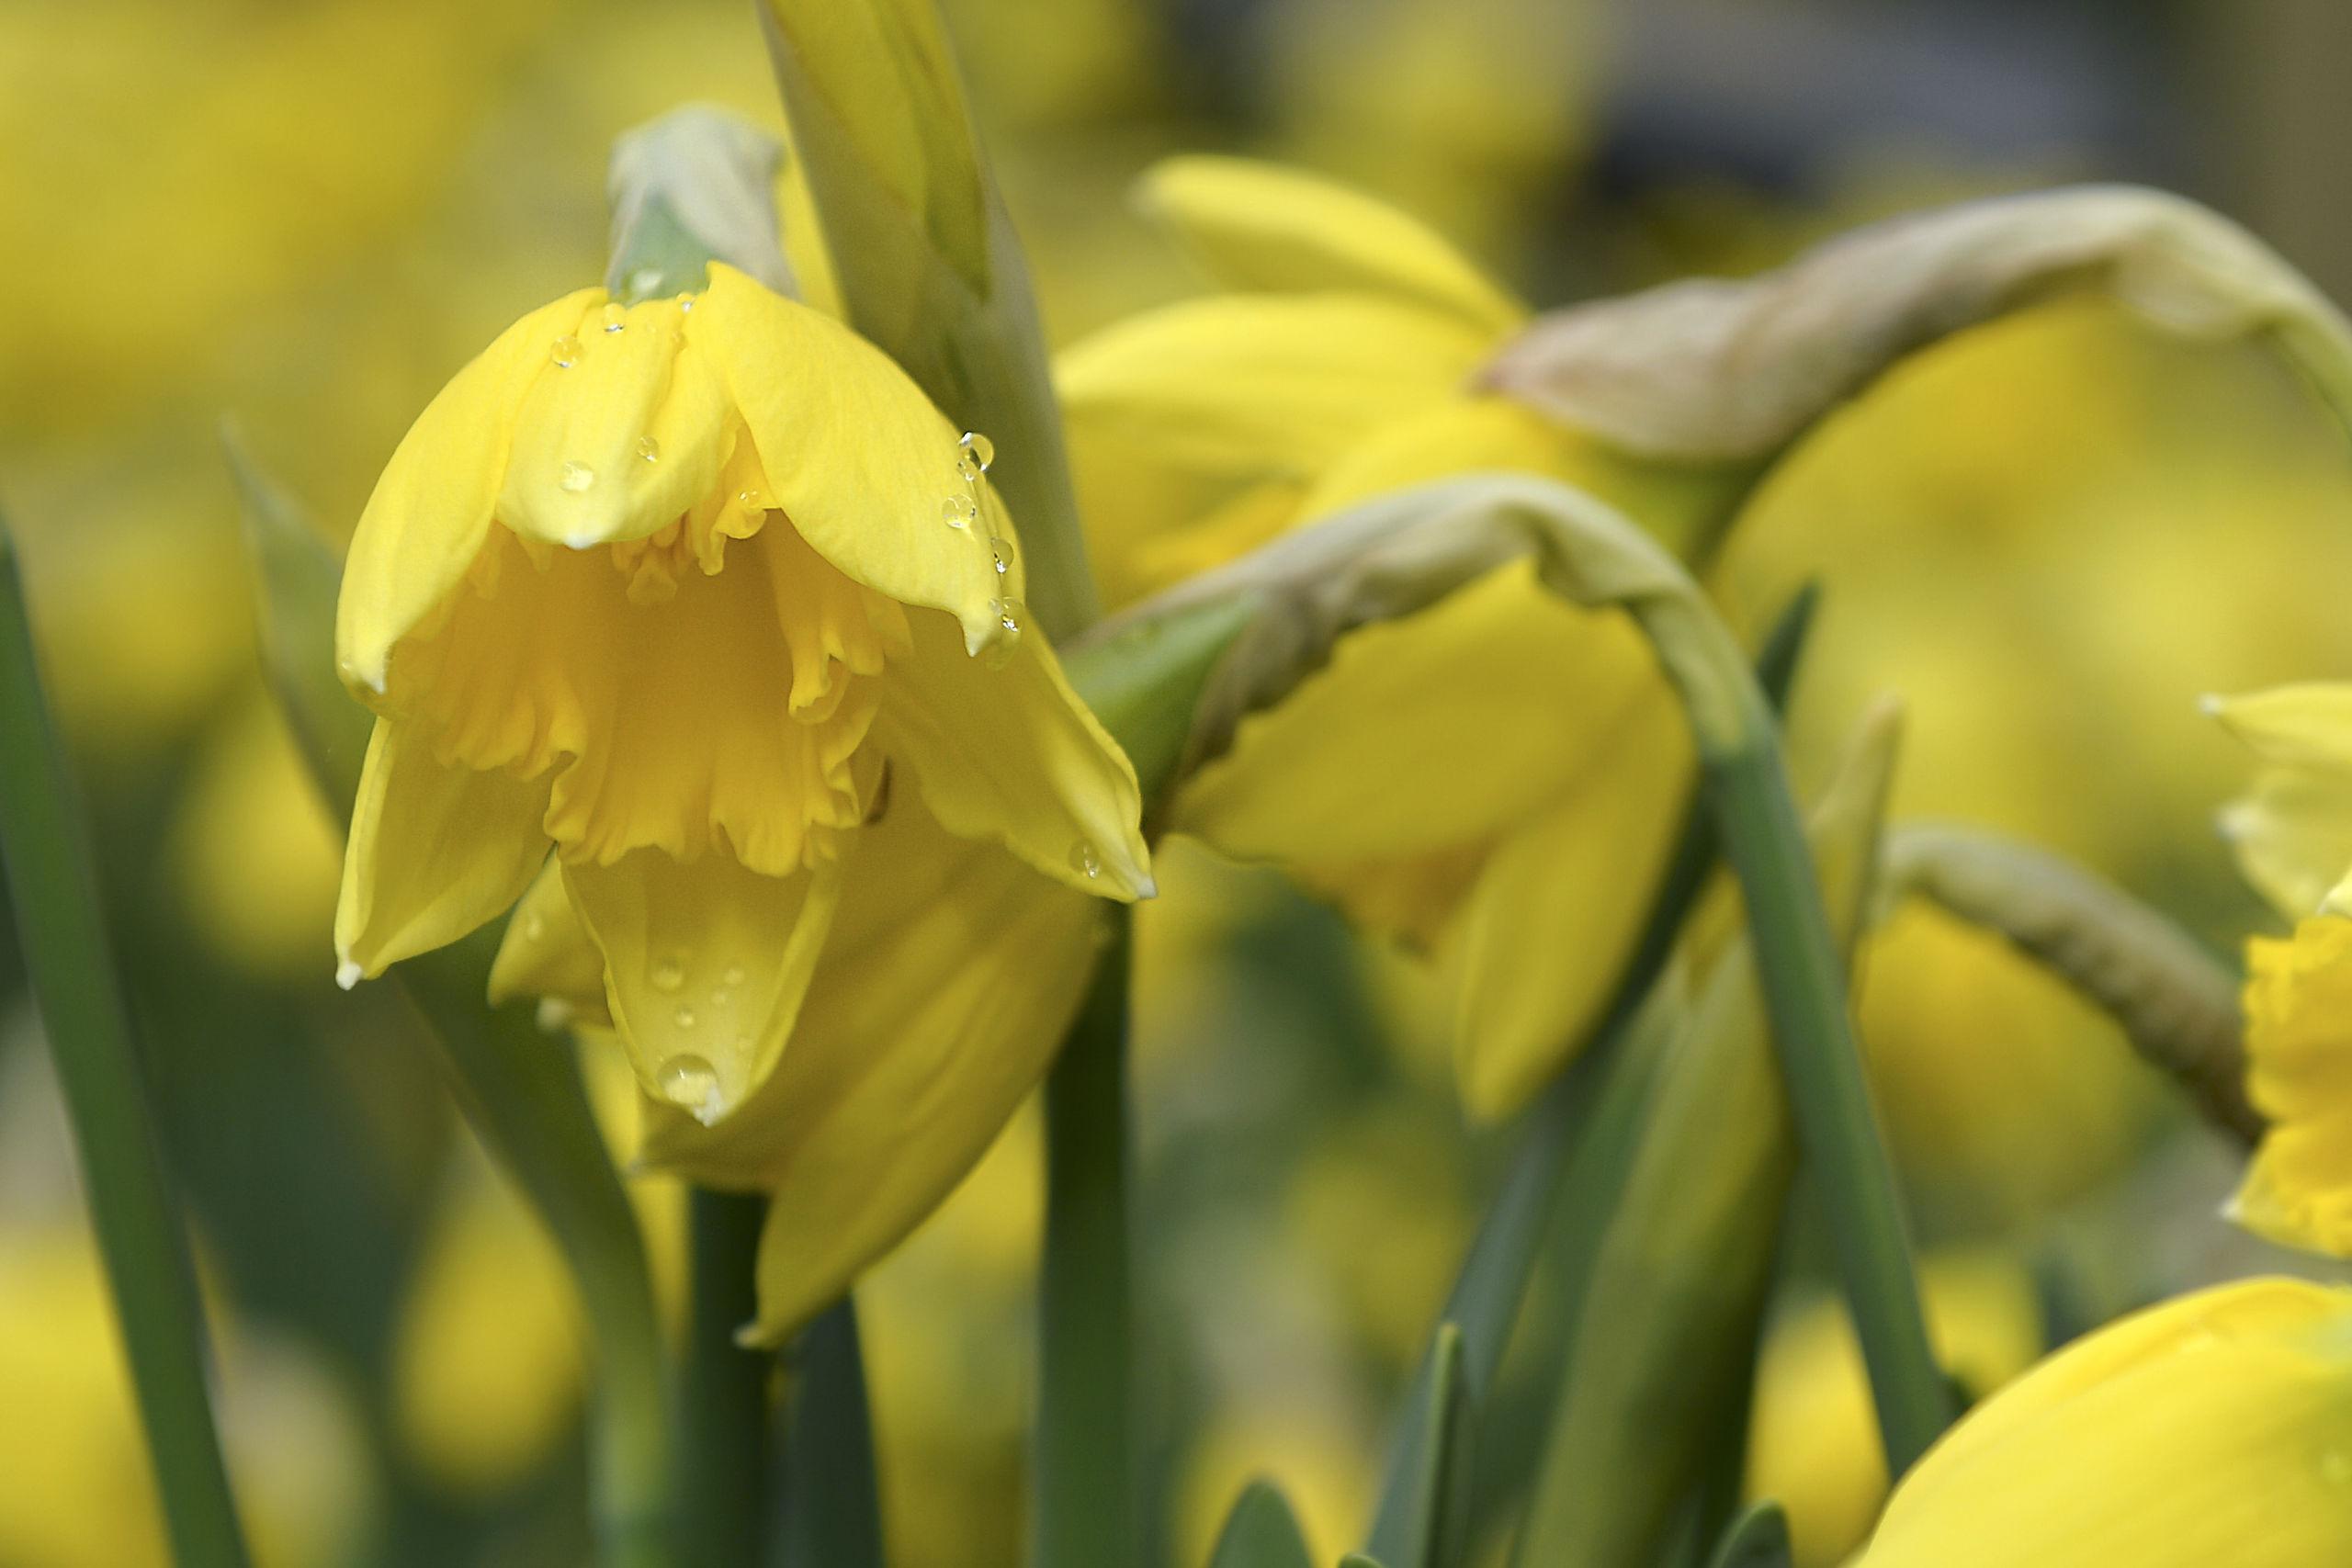 Vær med til at redde påskeliljer: Her kan du hente gratis blomsterløg